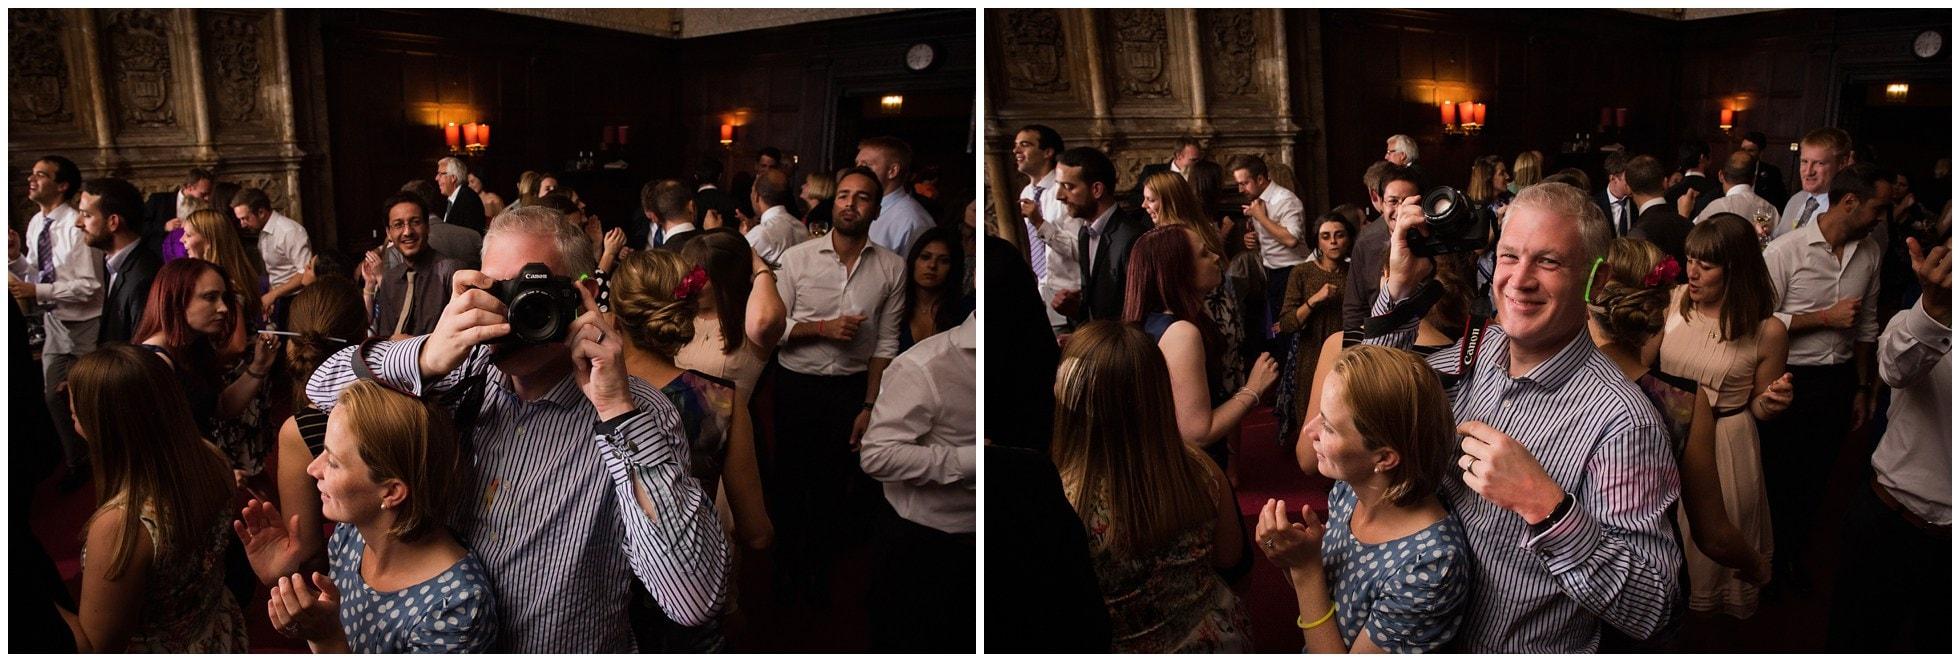 Photographer shooting a photographer at Oxford Union wedding reception